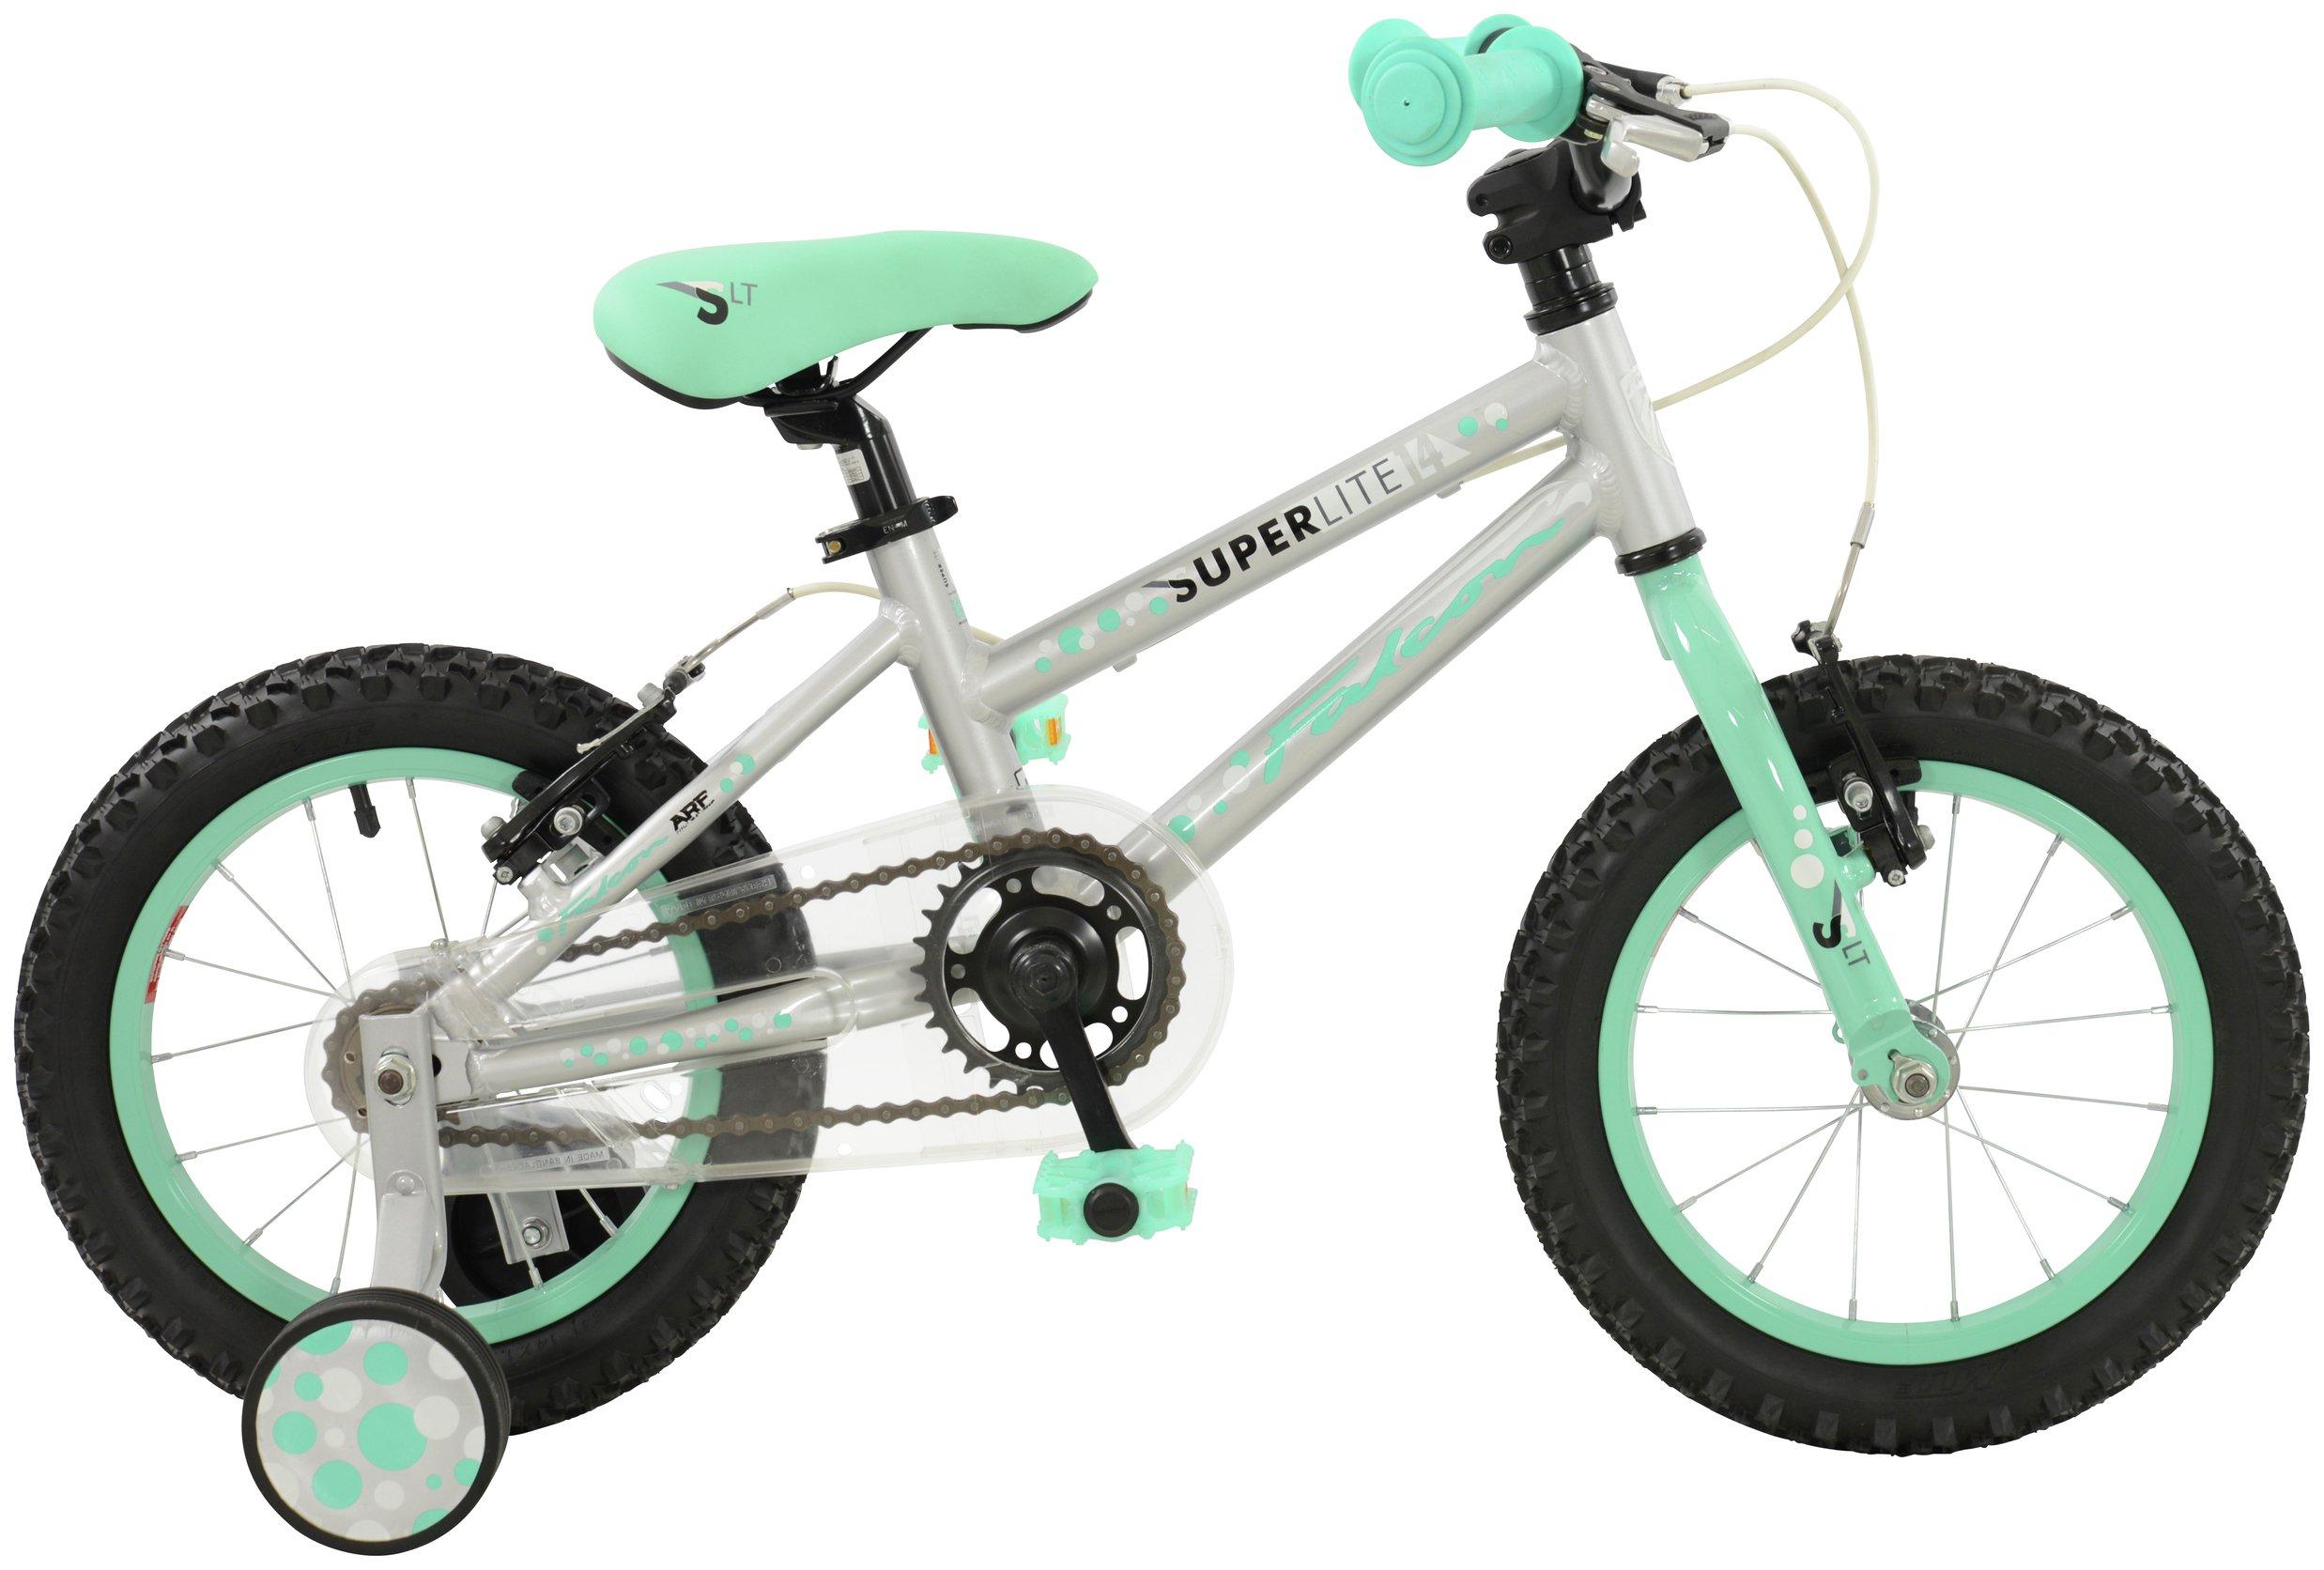 Image of Falcon Kids 14 Inch Alloy Superlite Bike - Mint Green